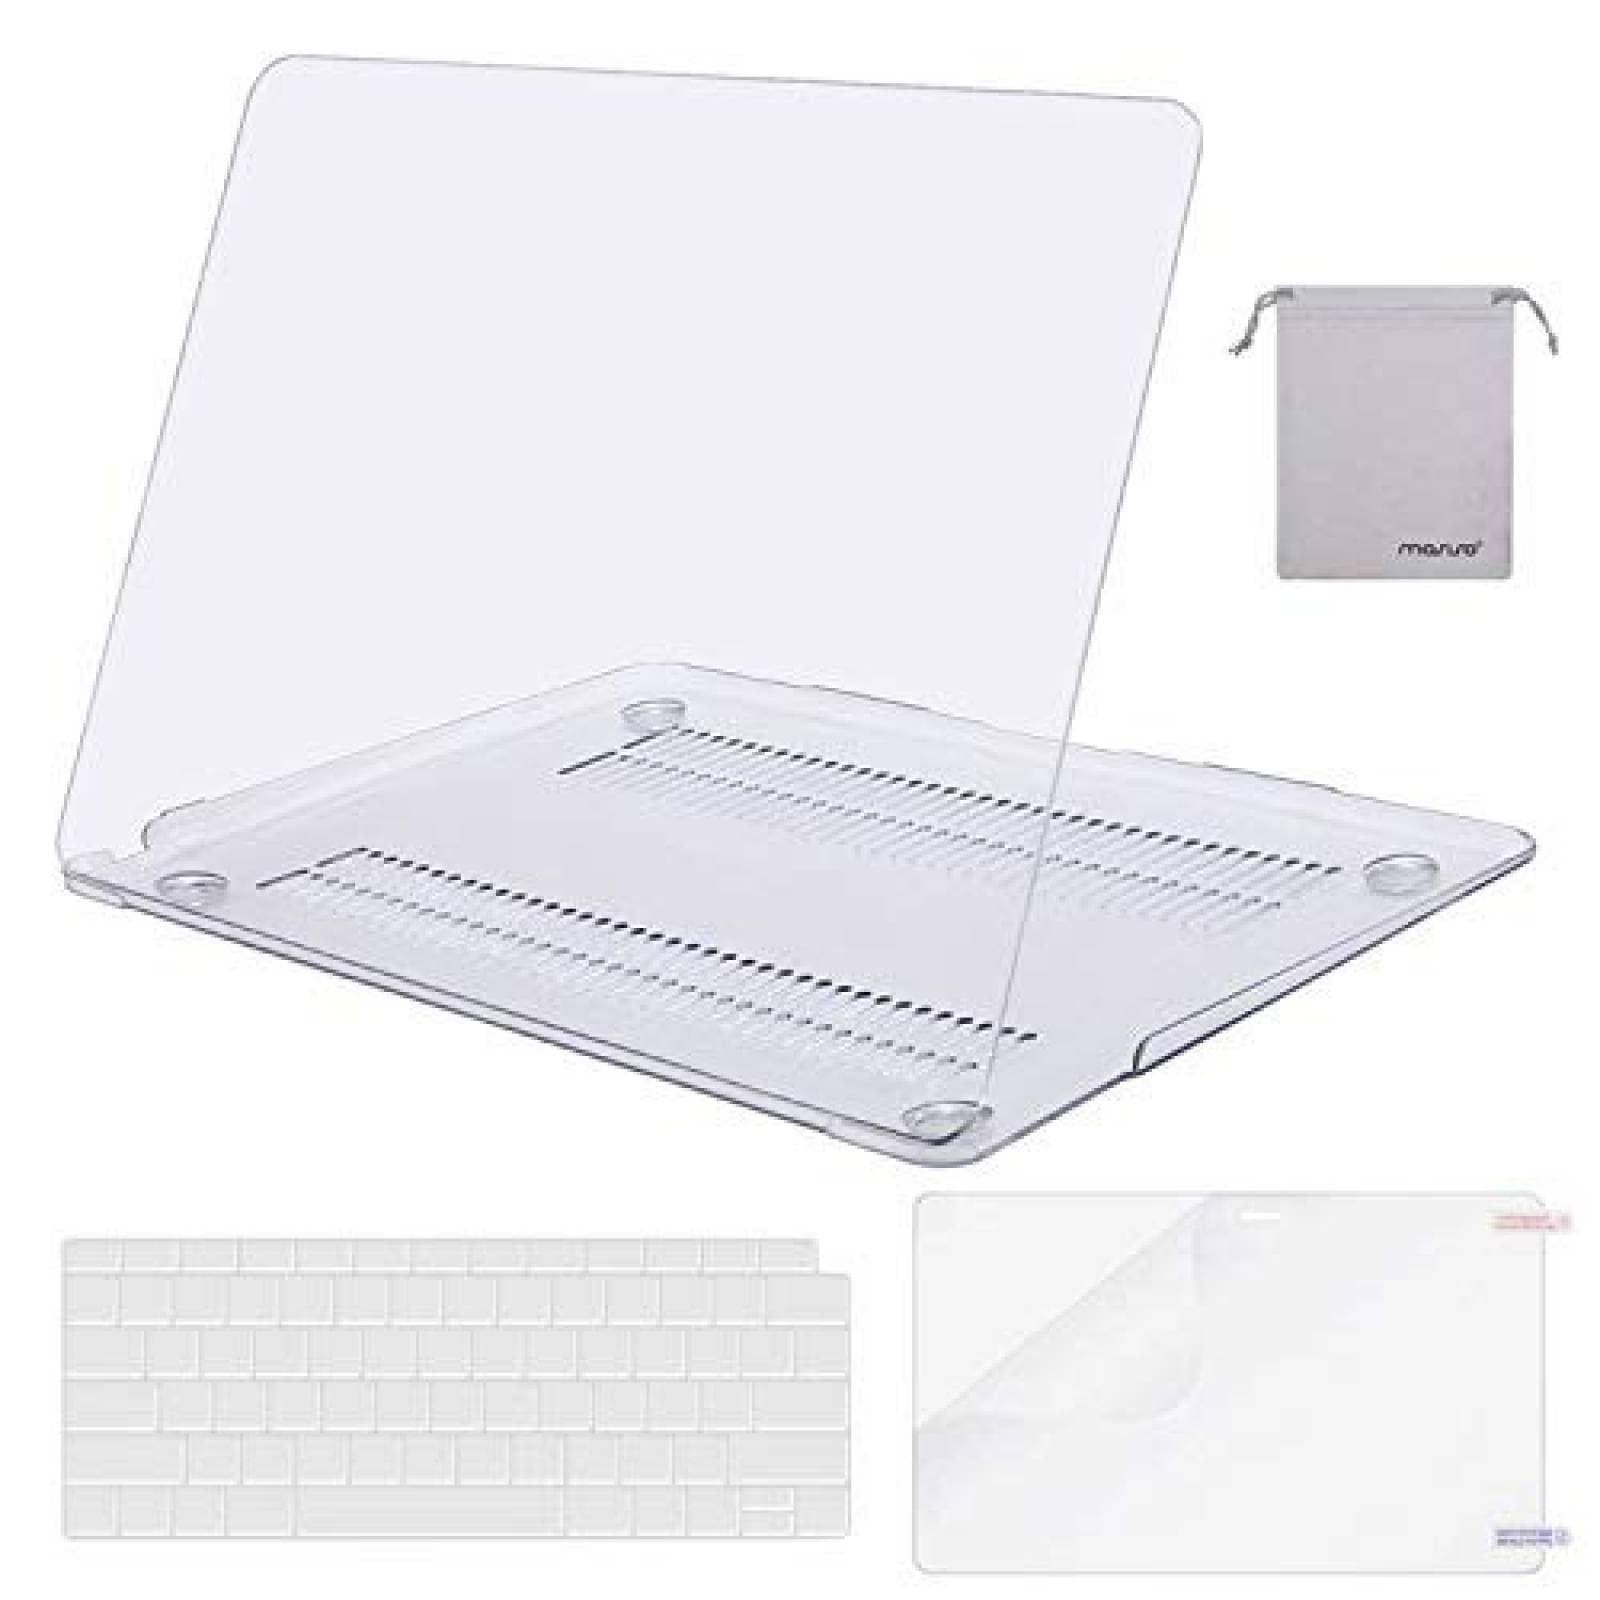 Carcasa para laptop MOSISO MacBook Air 13'' 2018 A1932 -Tran